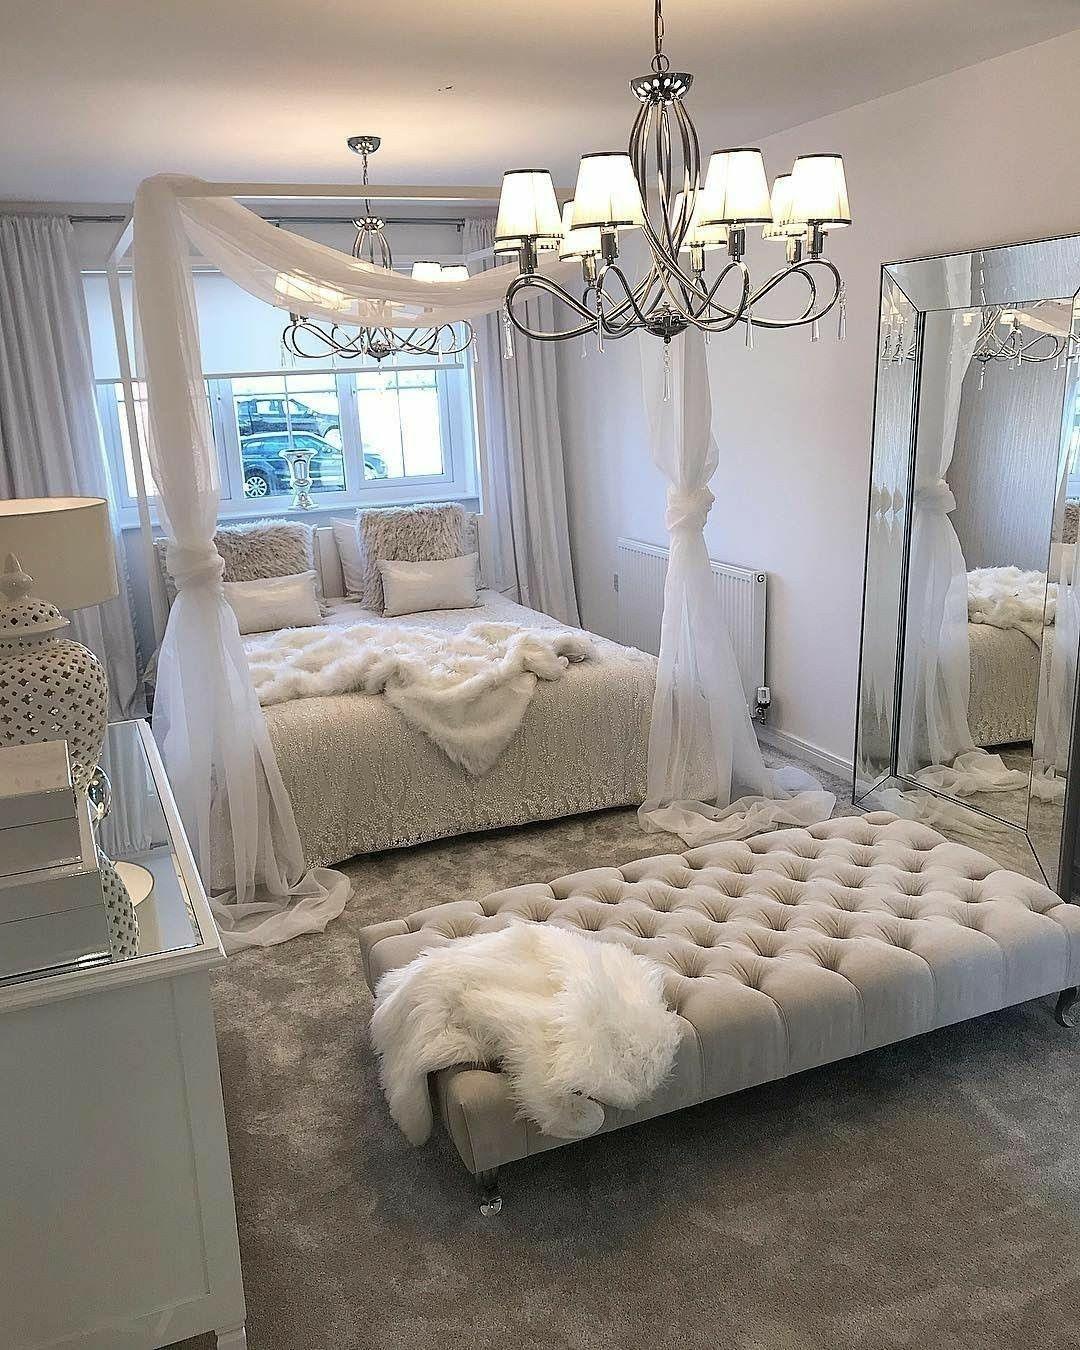 Pin By Tatyana Belitskaya On Dream House Bedroom Decor For